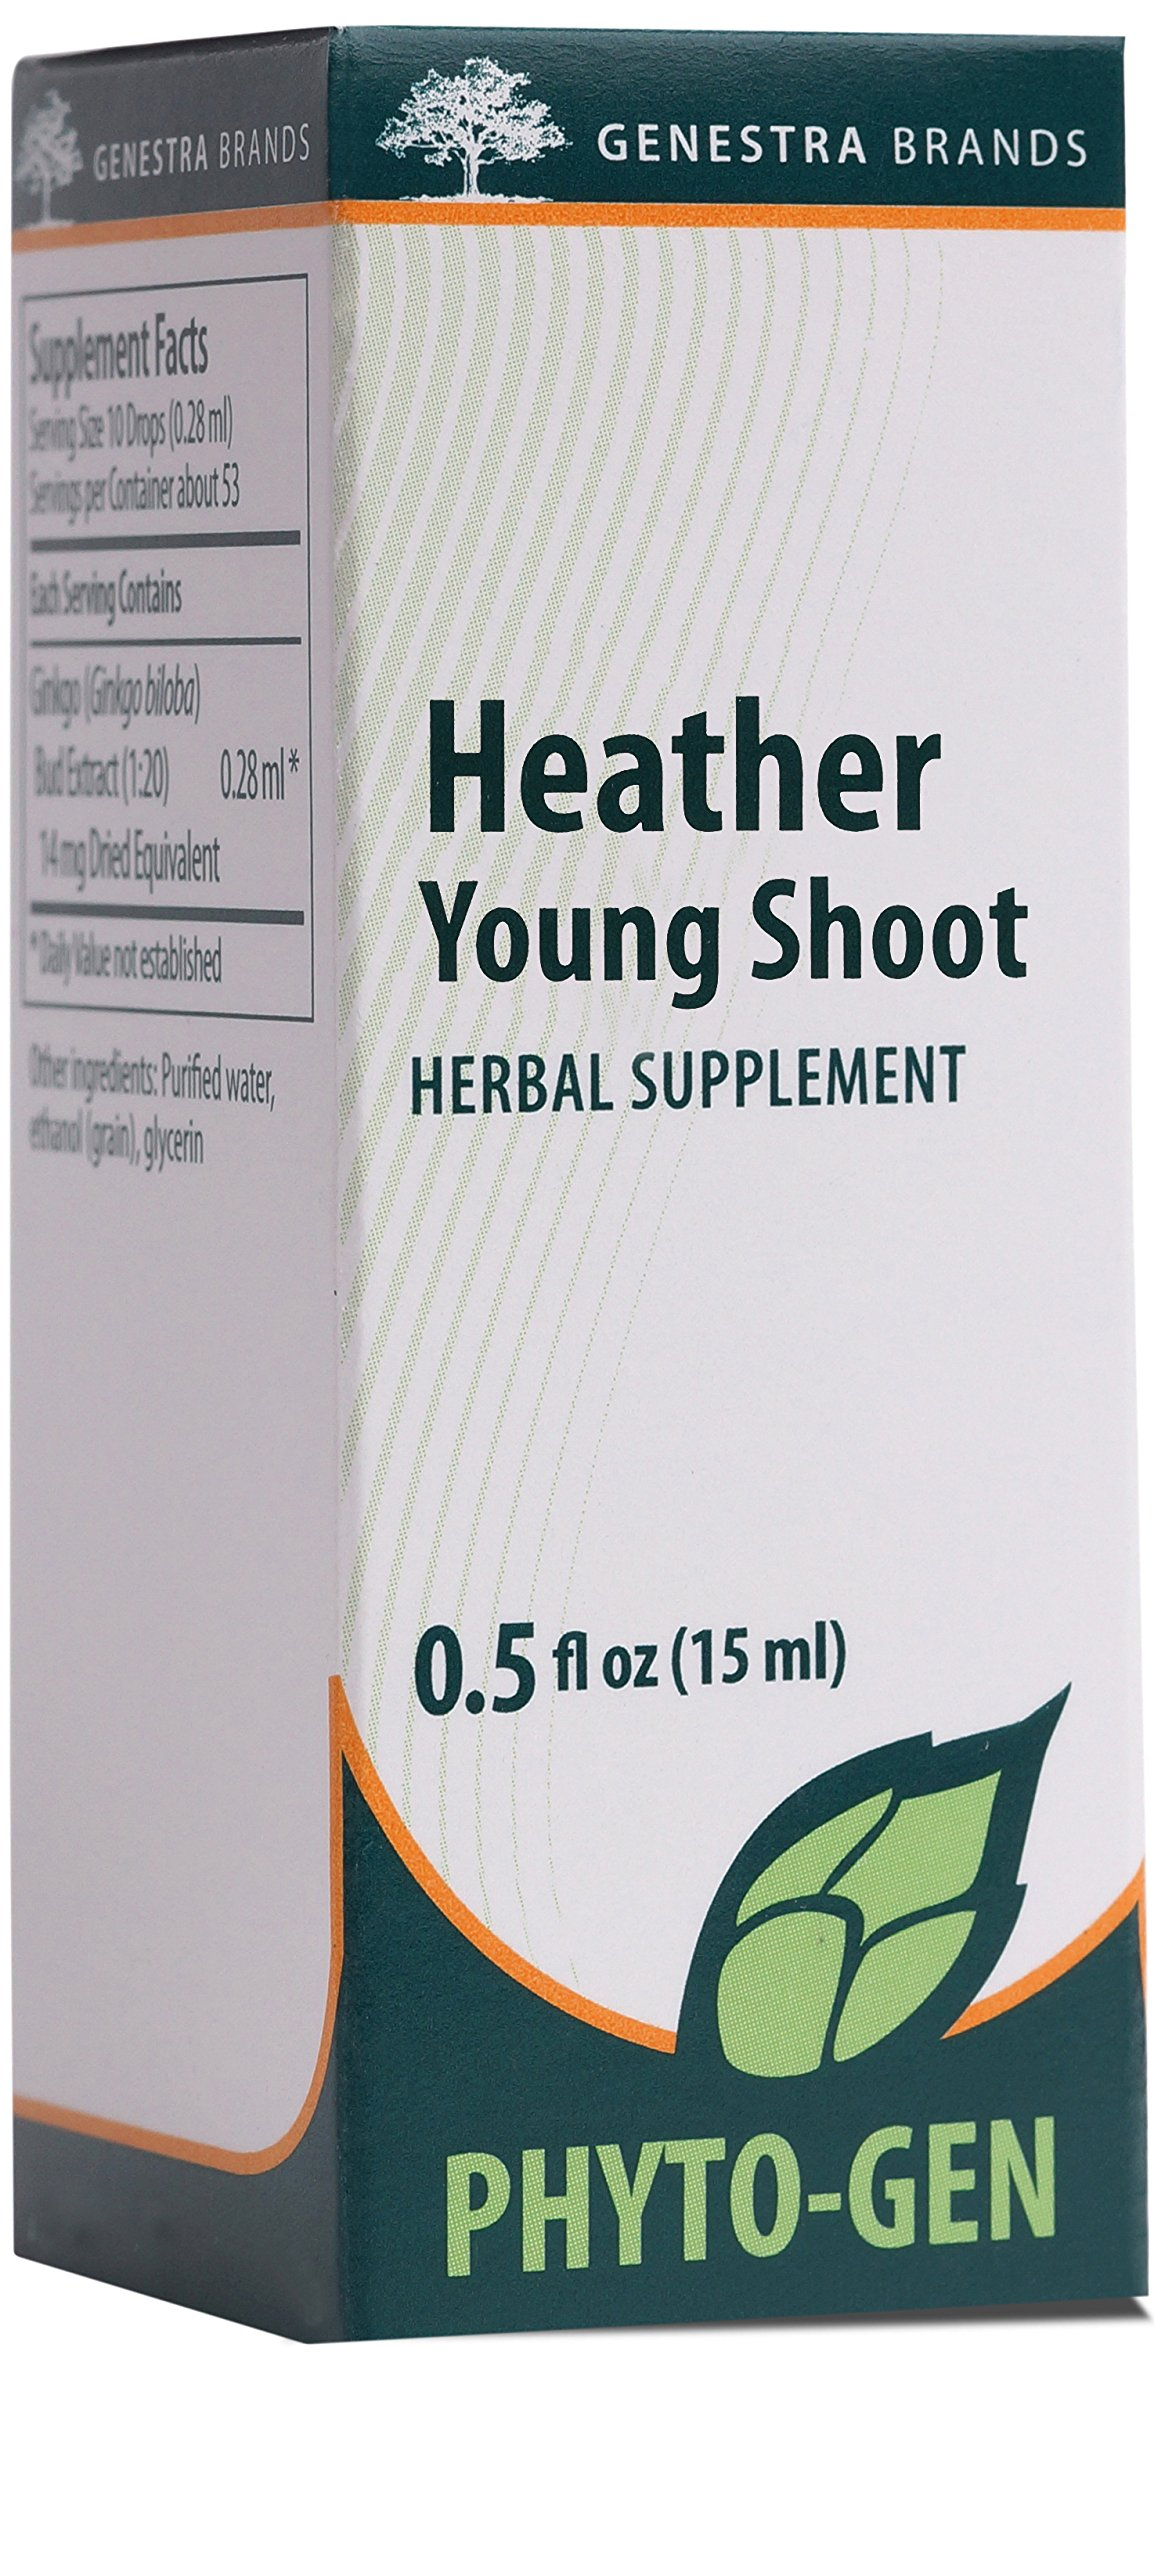 Genestra Brands - Heather Young Shoot - Herbal Supplement - 0.5 fl oz (15 ml)